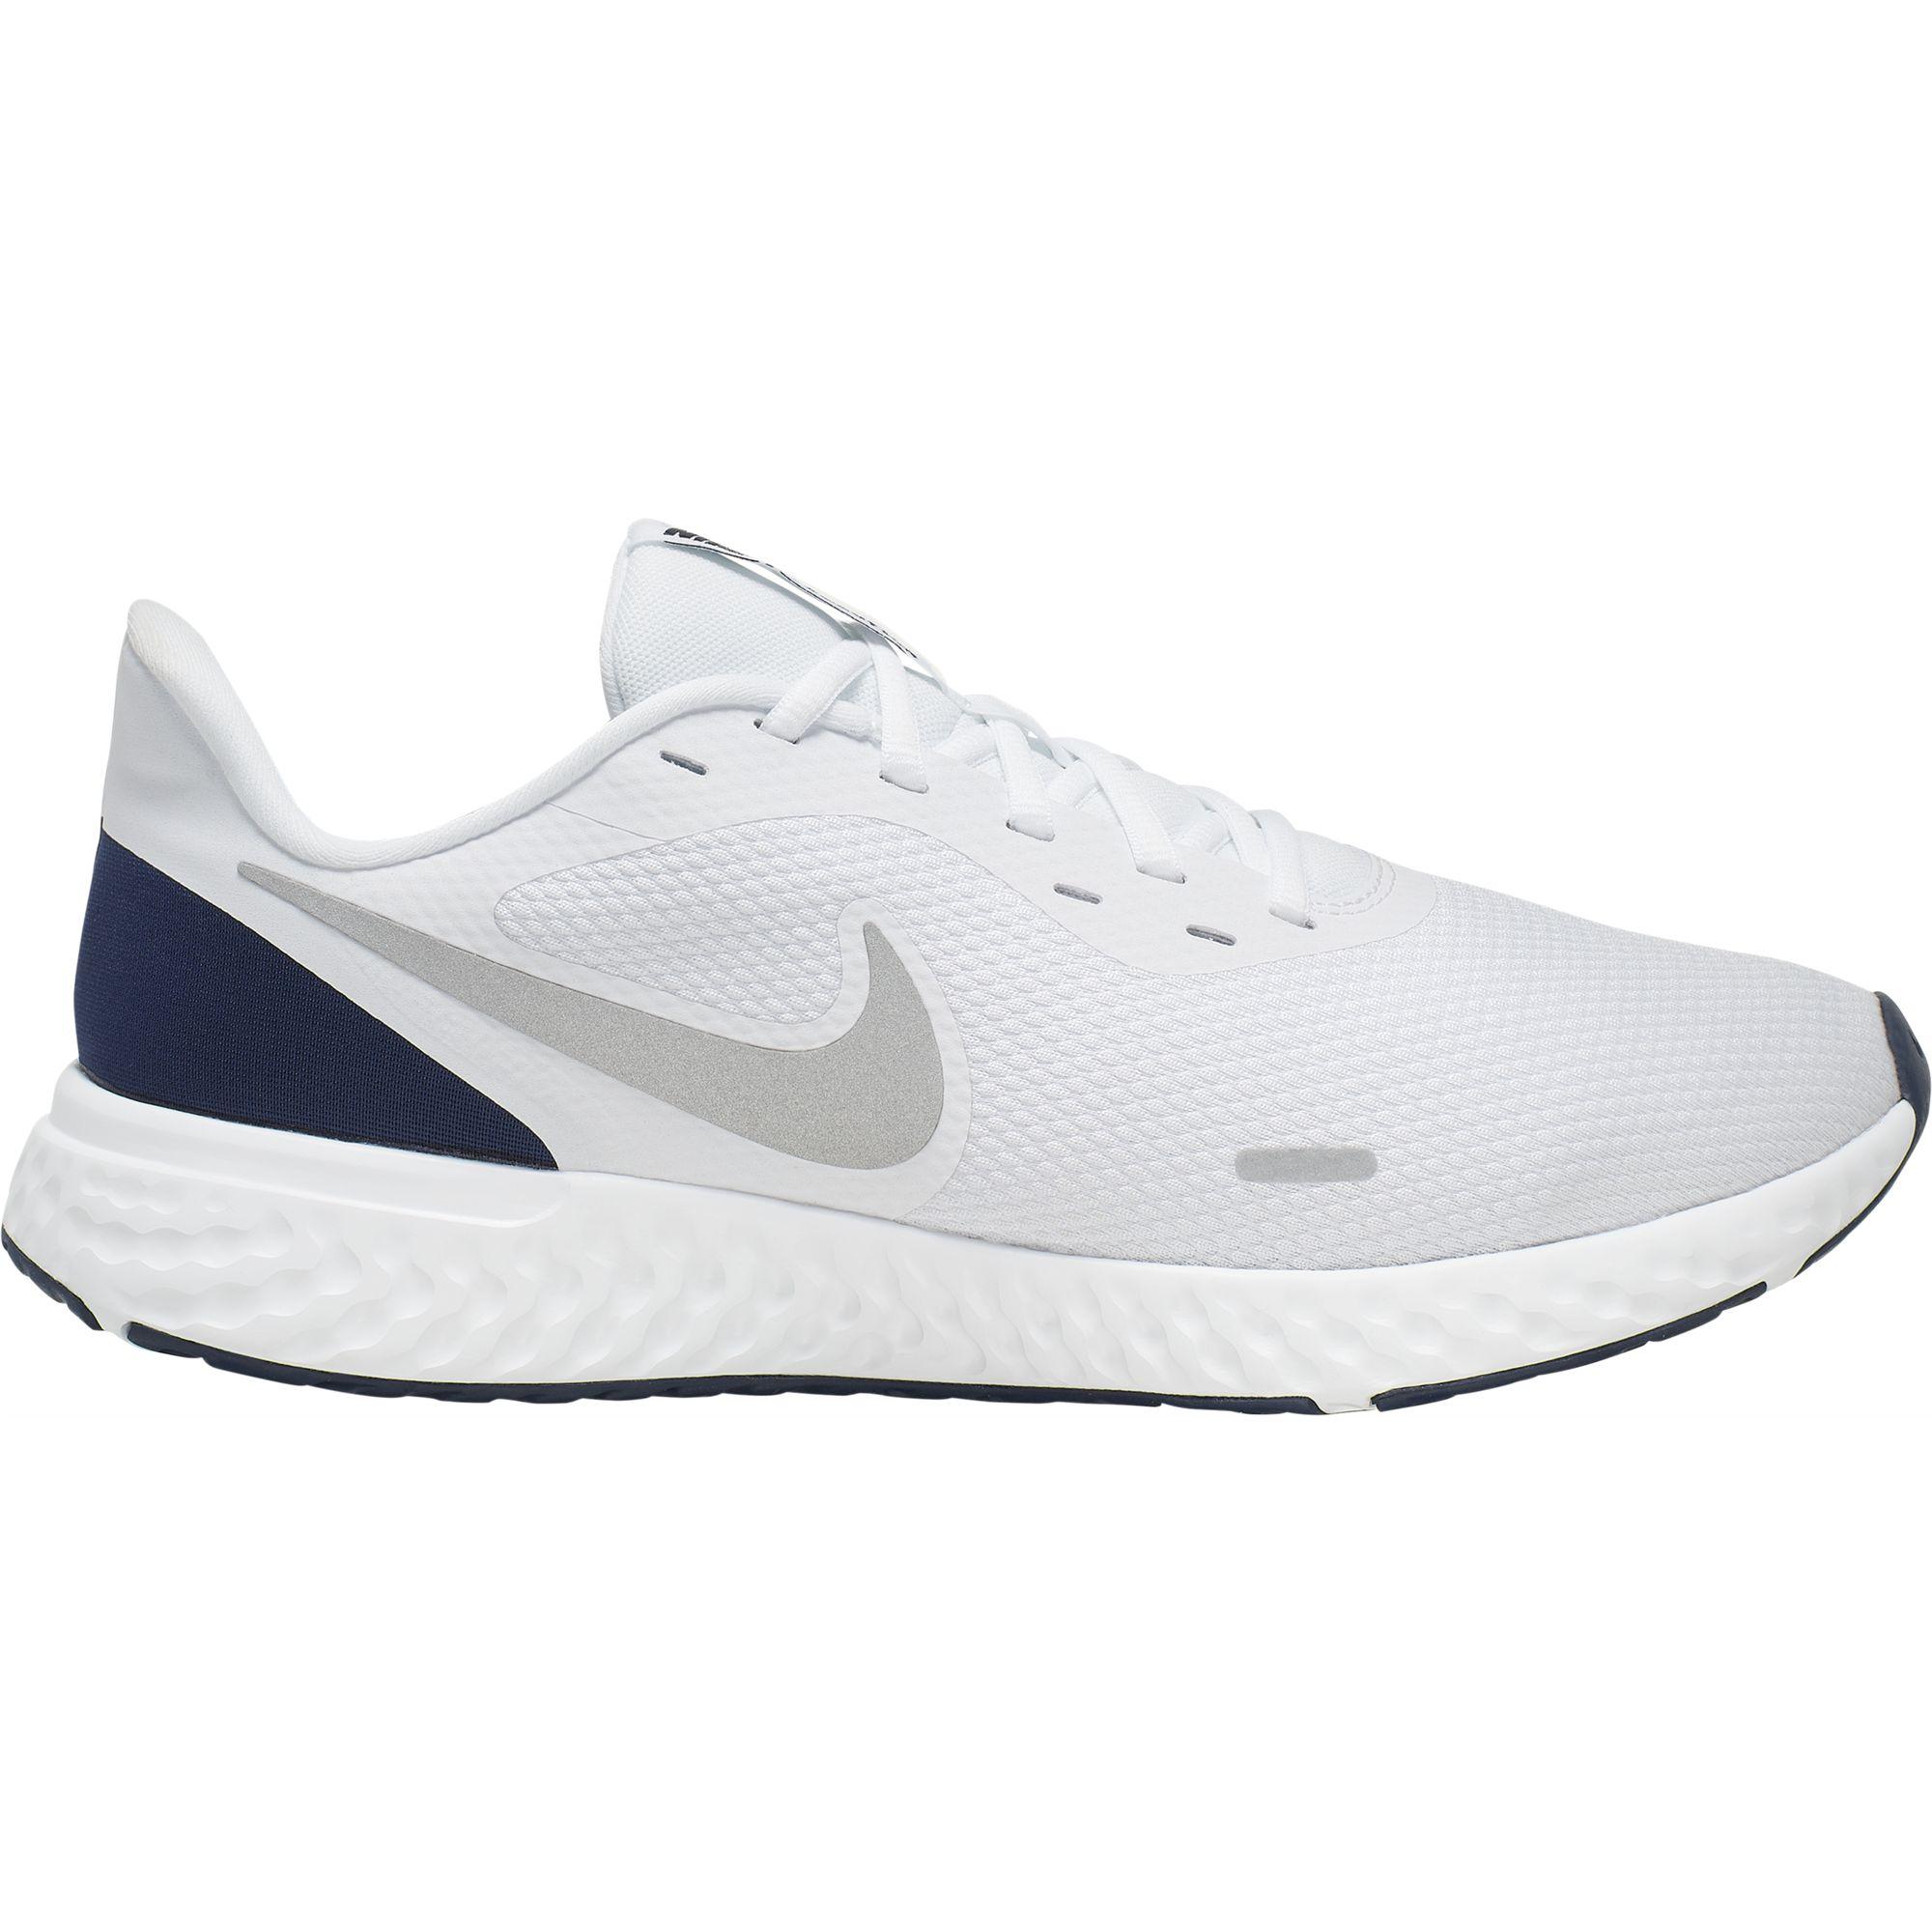 Men's Revolution 5 Running Shoes, White/Navy, swatch